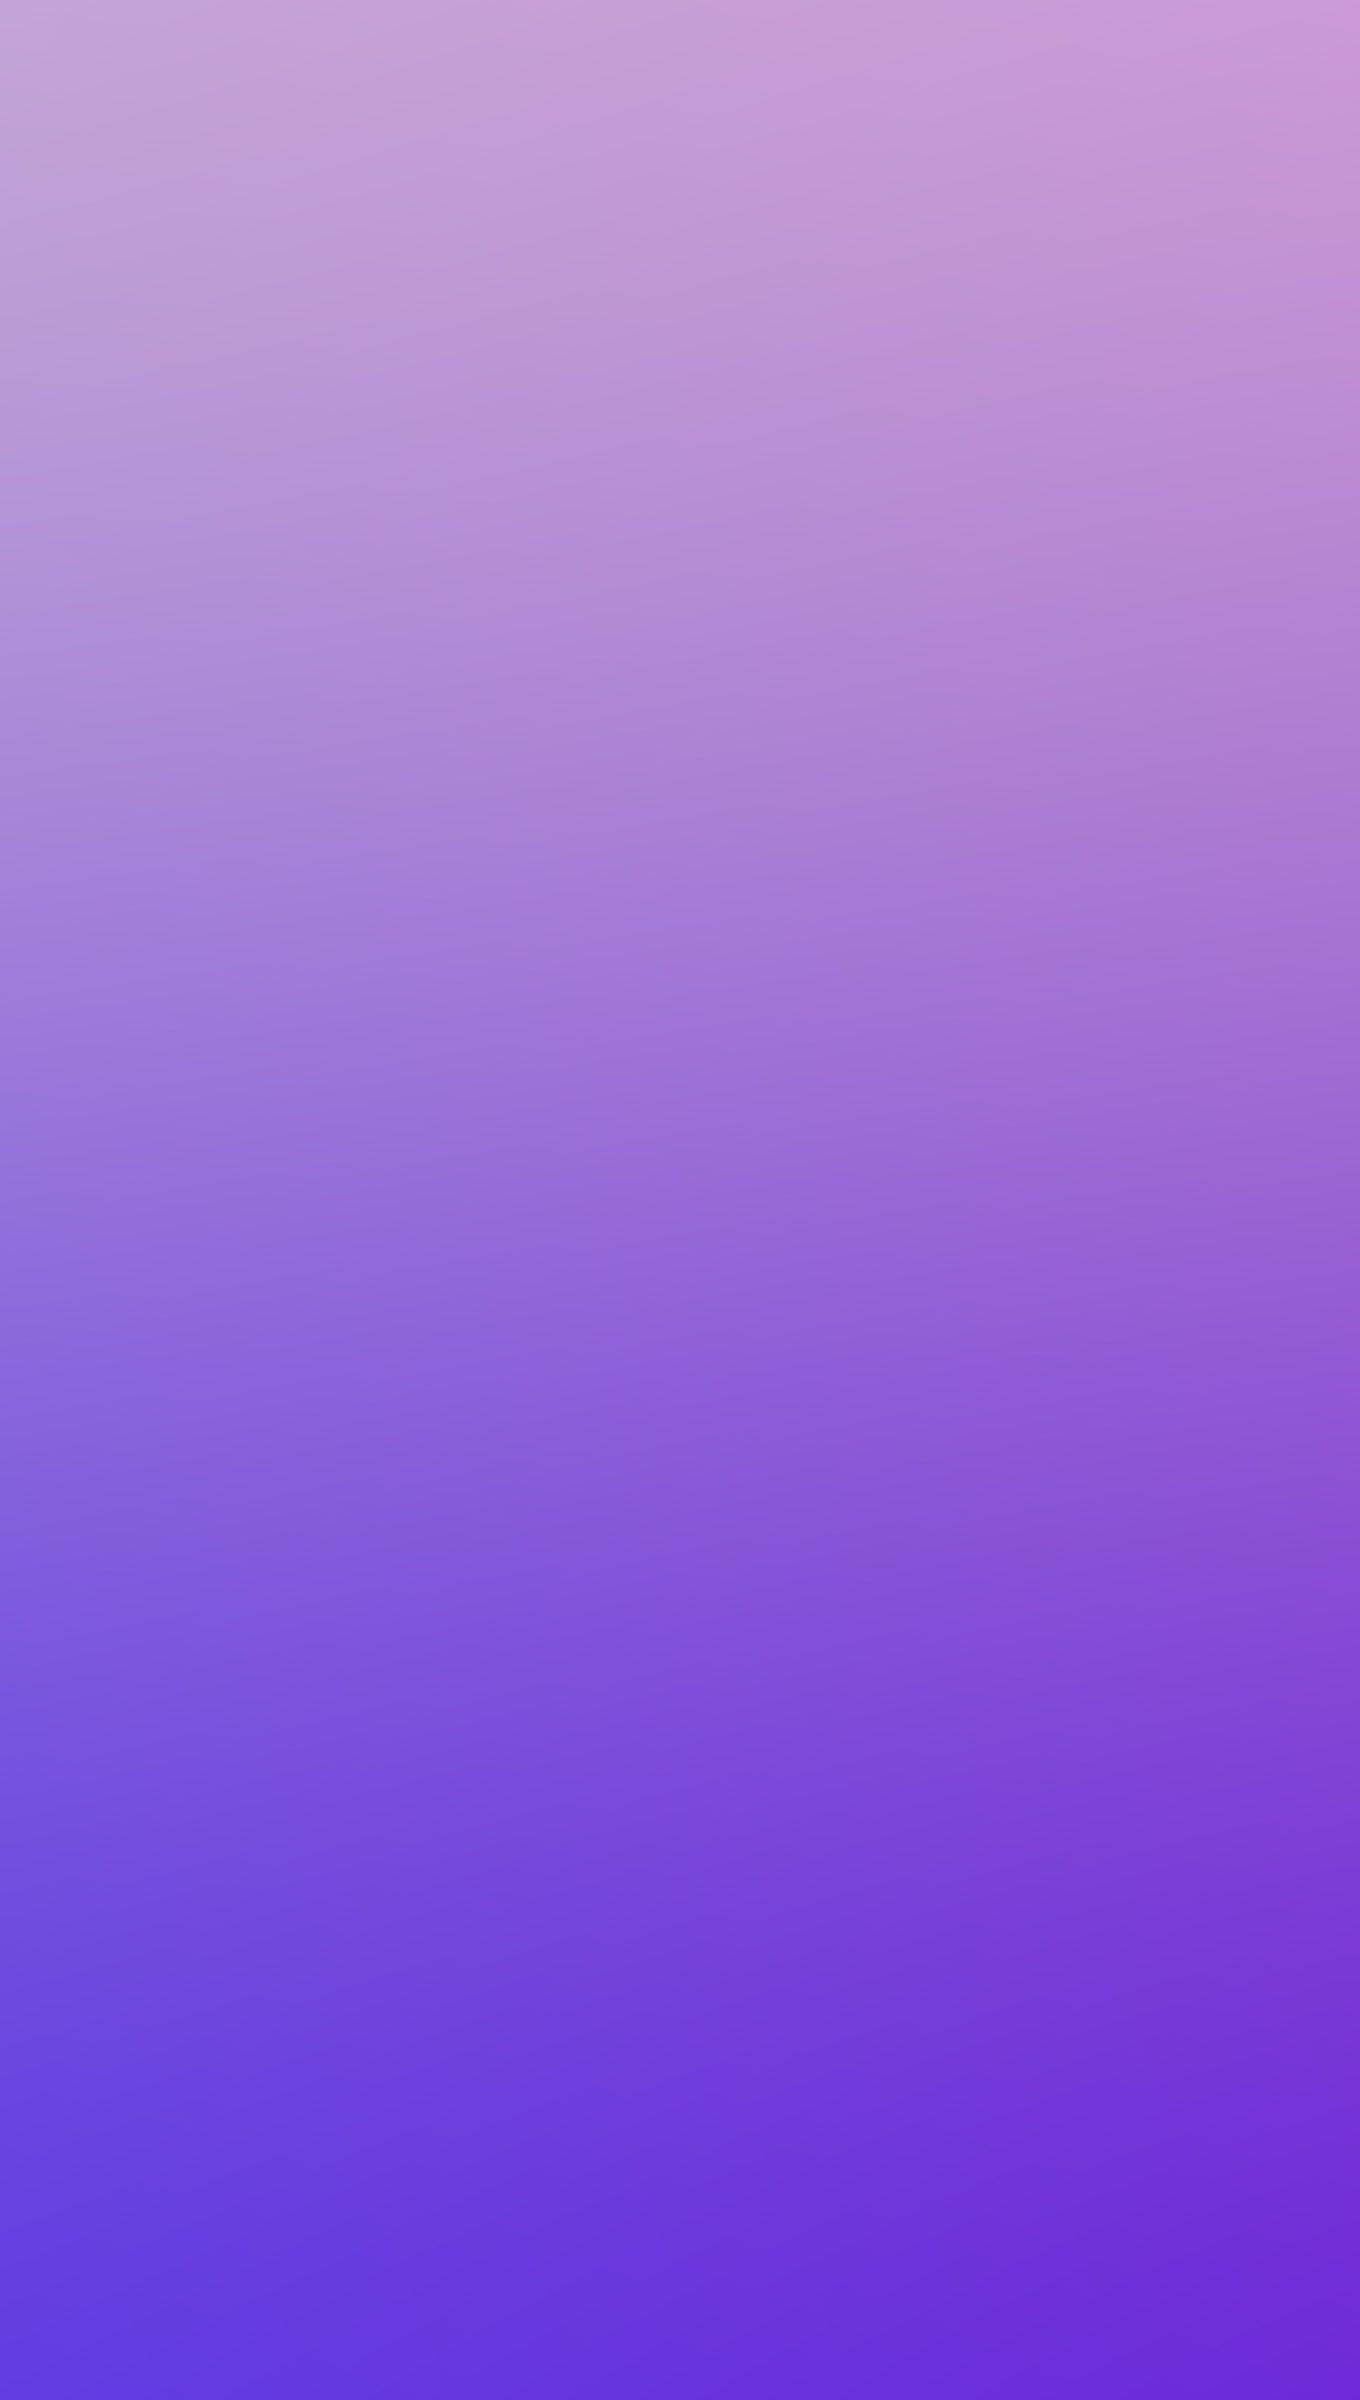 Wallpaper Purple blur gradient Vertical